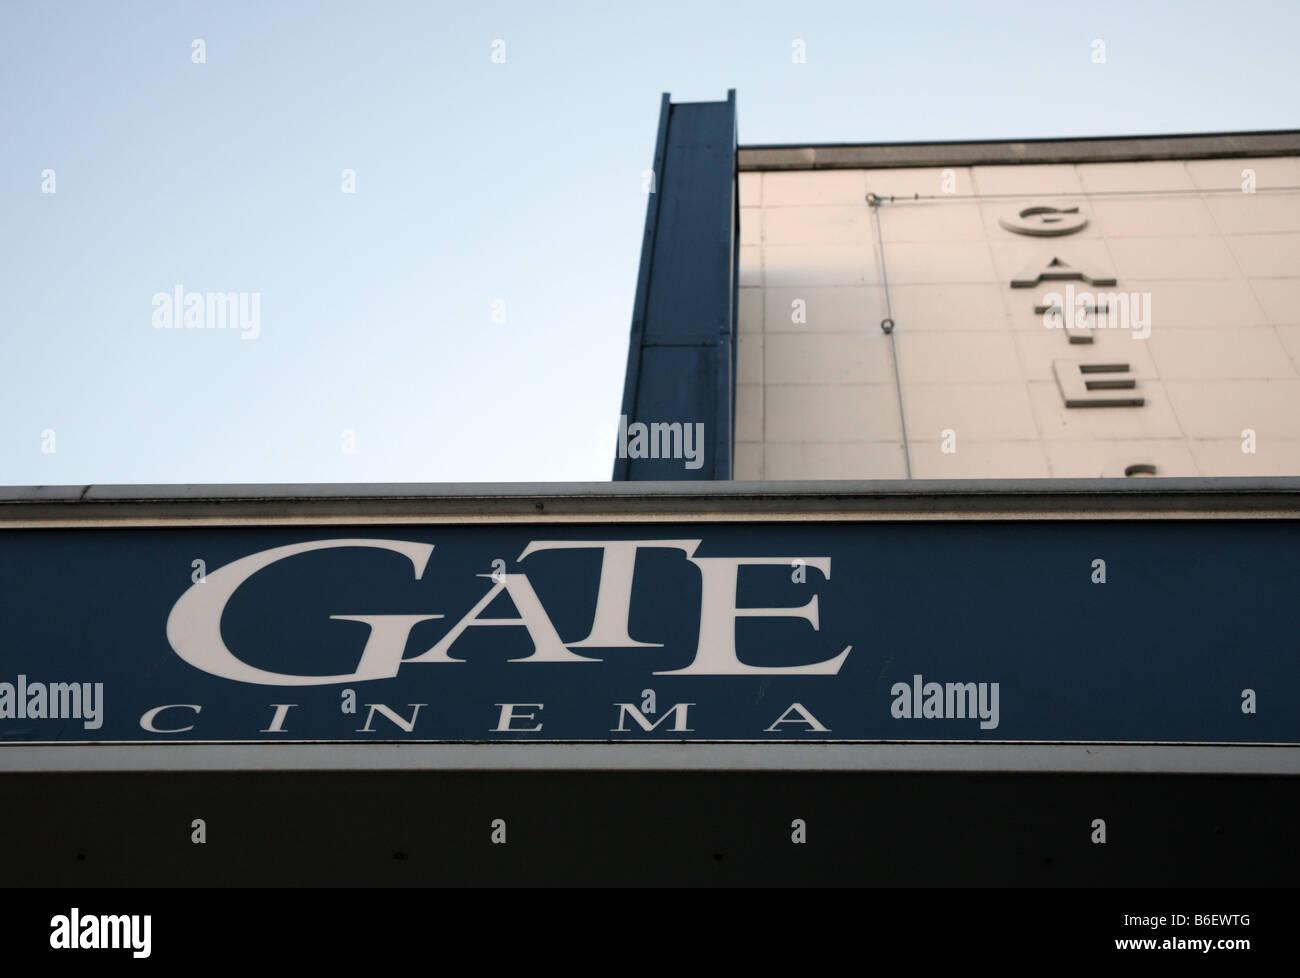 Gate cinema Notting Hill Gate, London - Stock Image